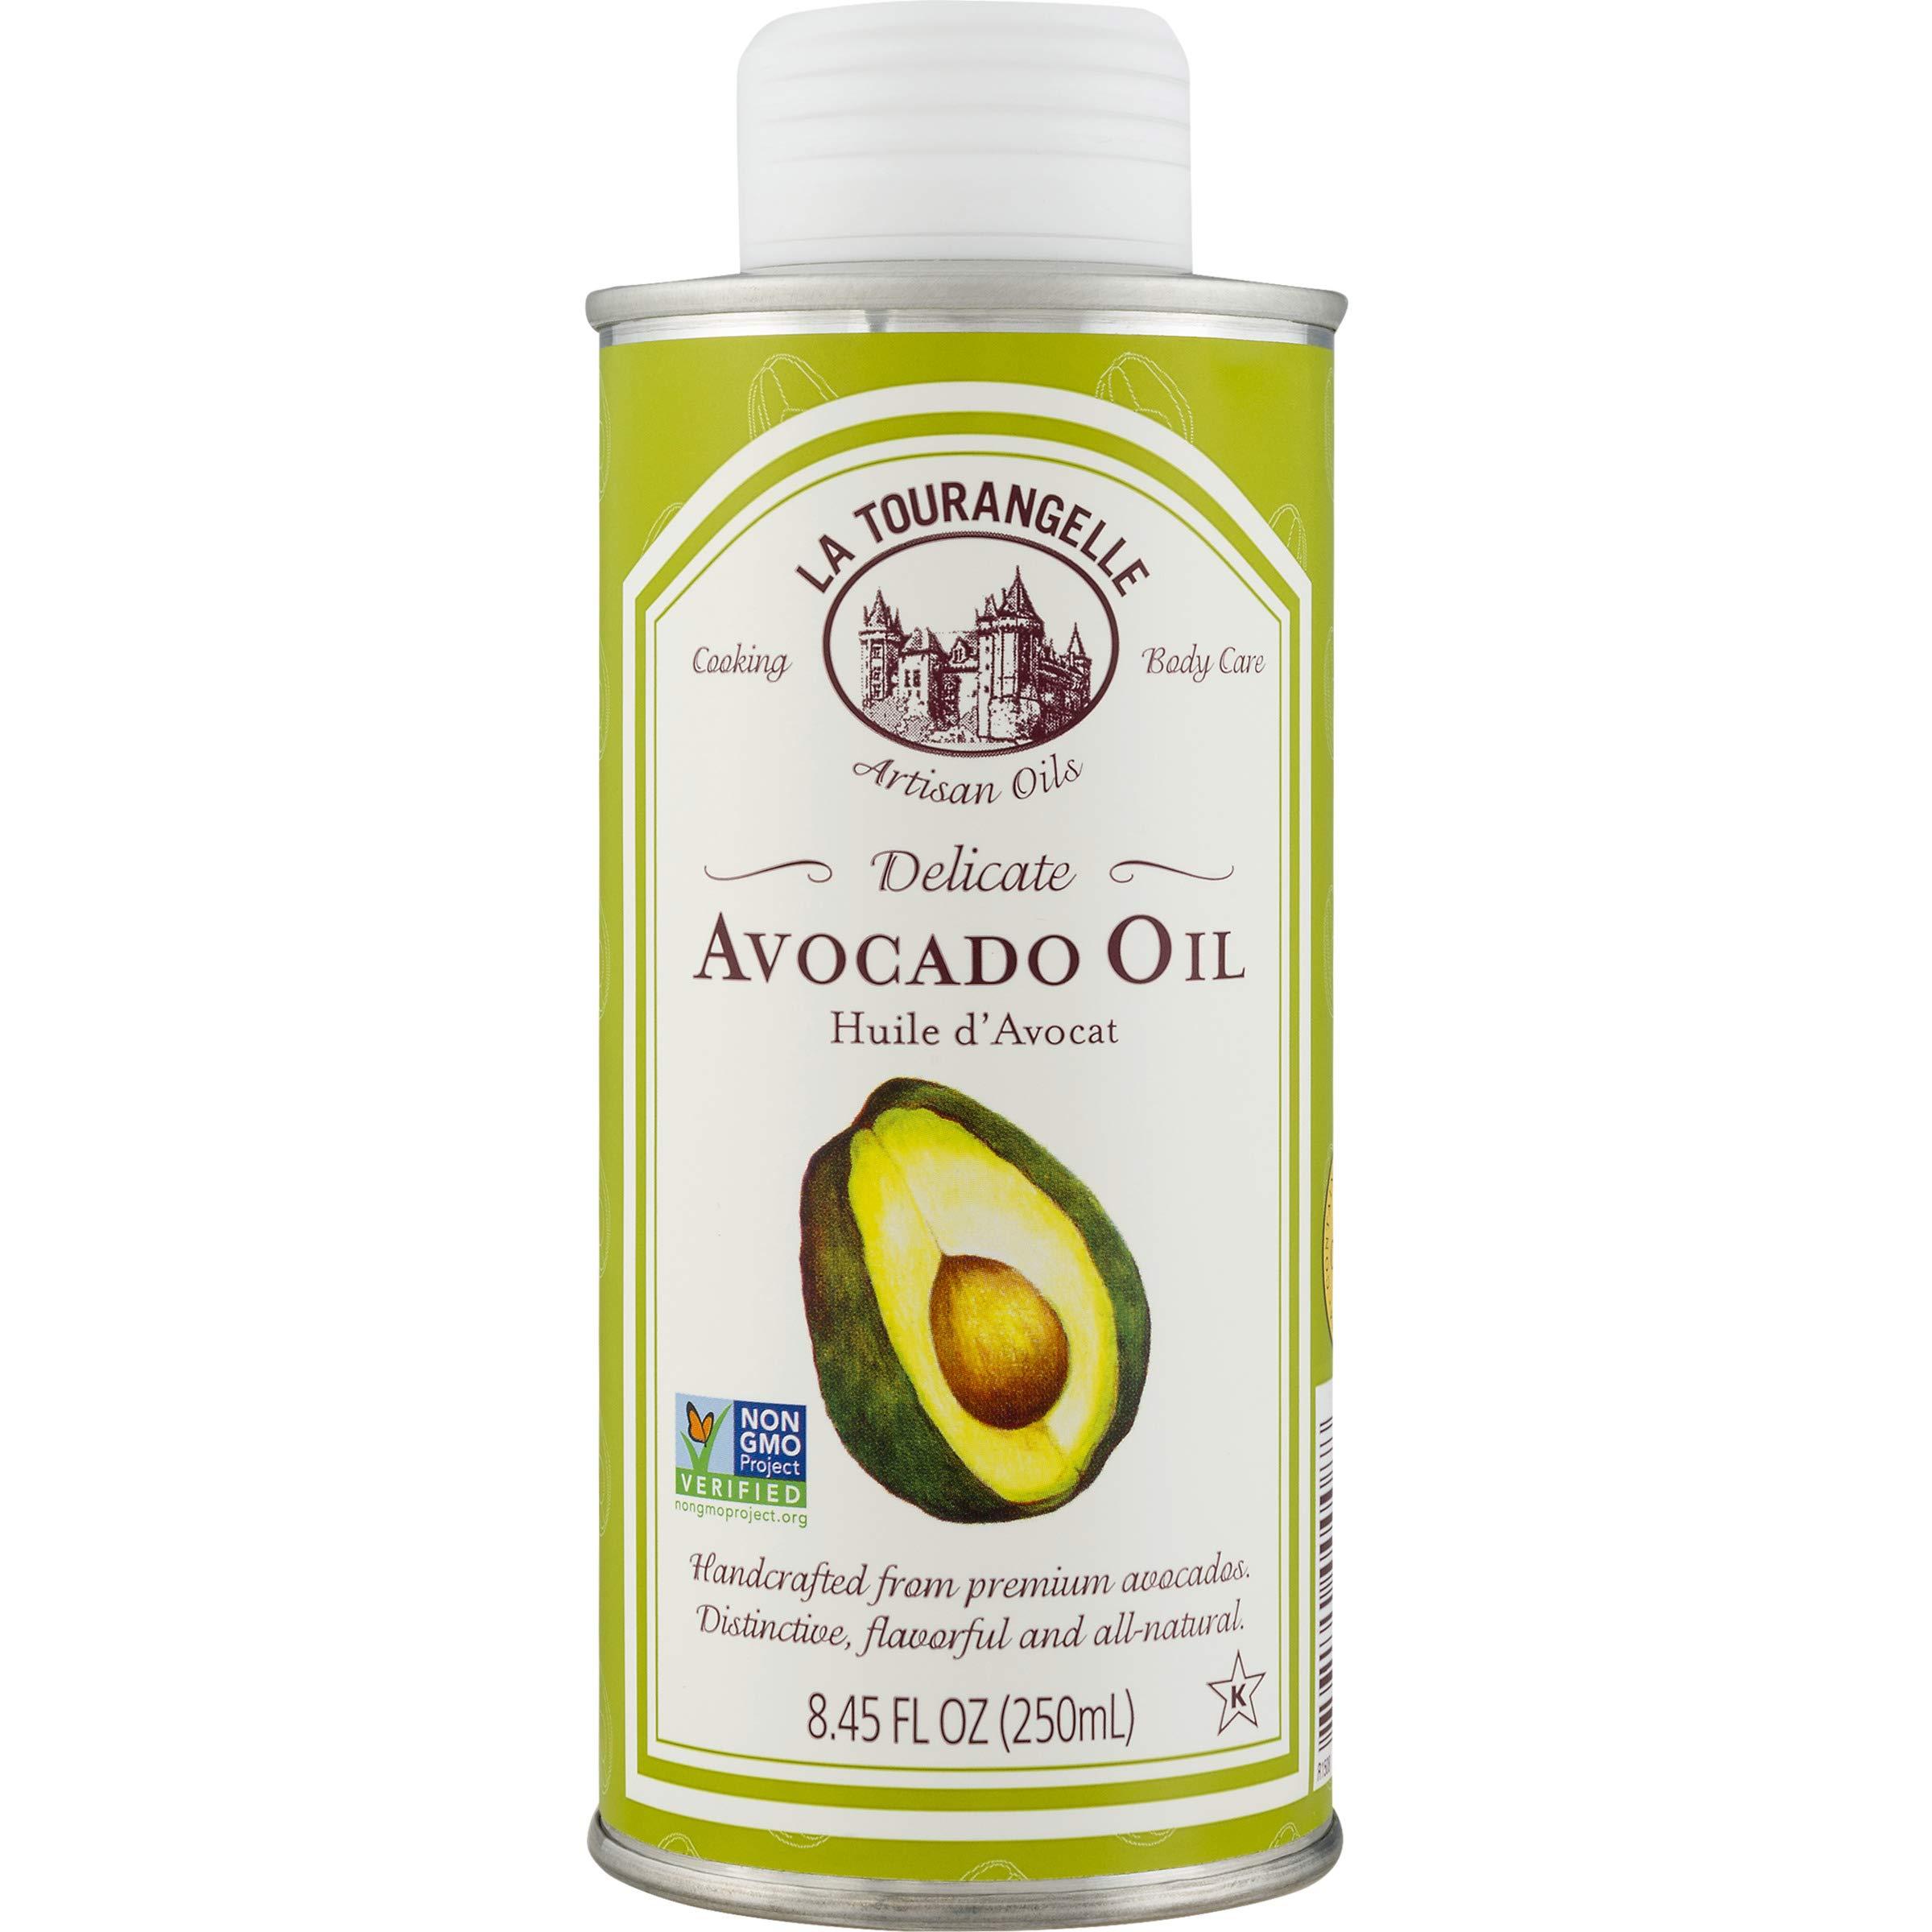 La Tourangelle Avocado Oil 8.45 Fl. Oz., All-Natural, Artisanal, Great for Salads, Fruit, Fish or Vegetables, Great Buttery Flavor by La Tourangelle